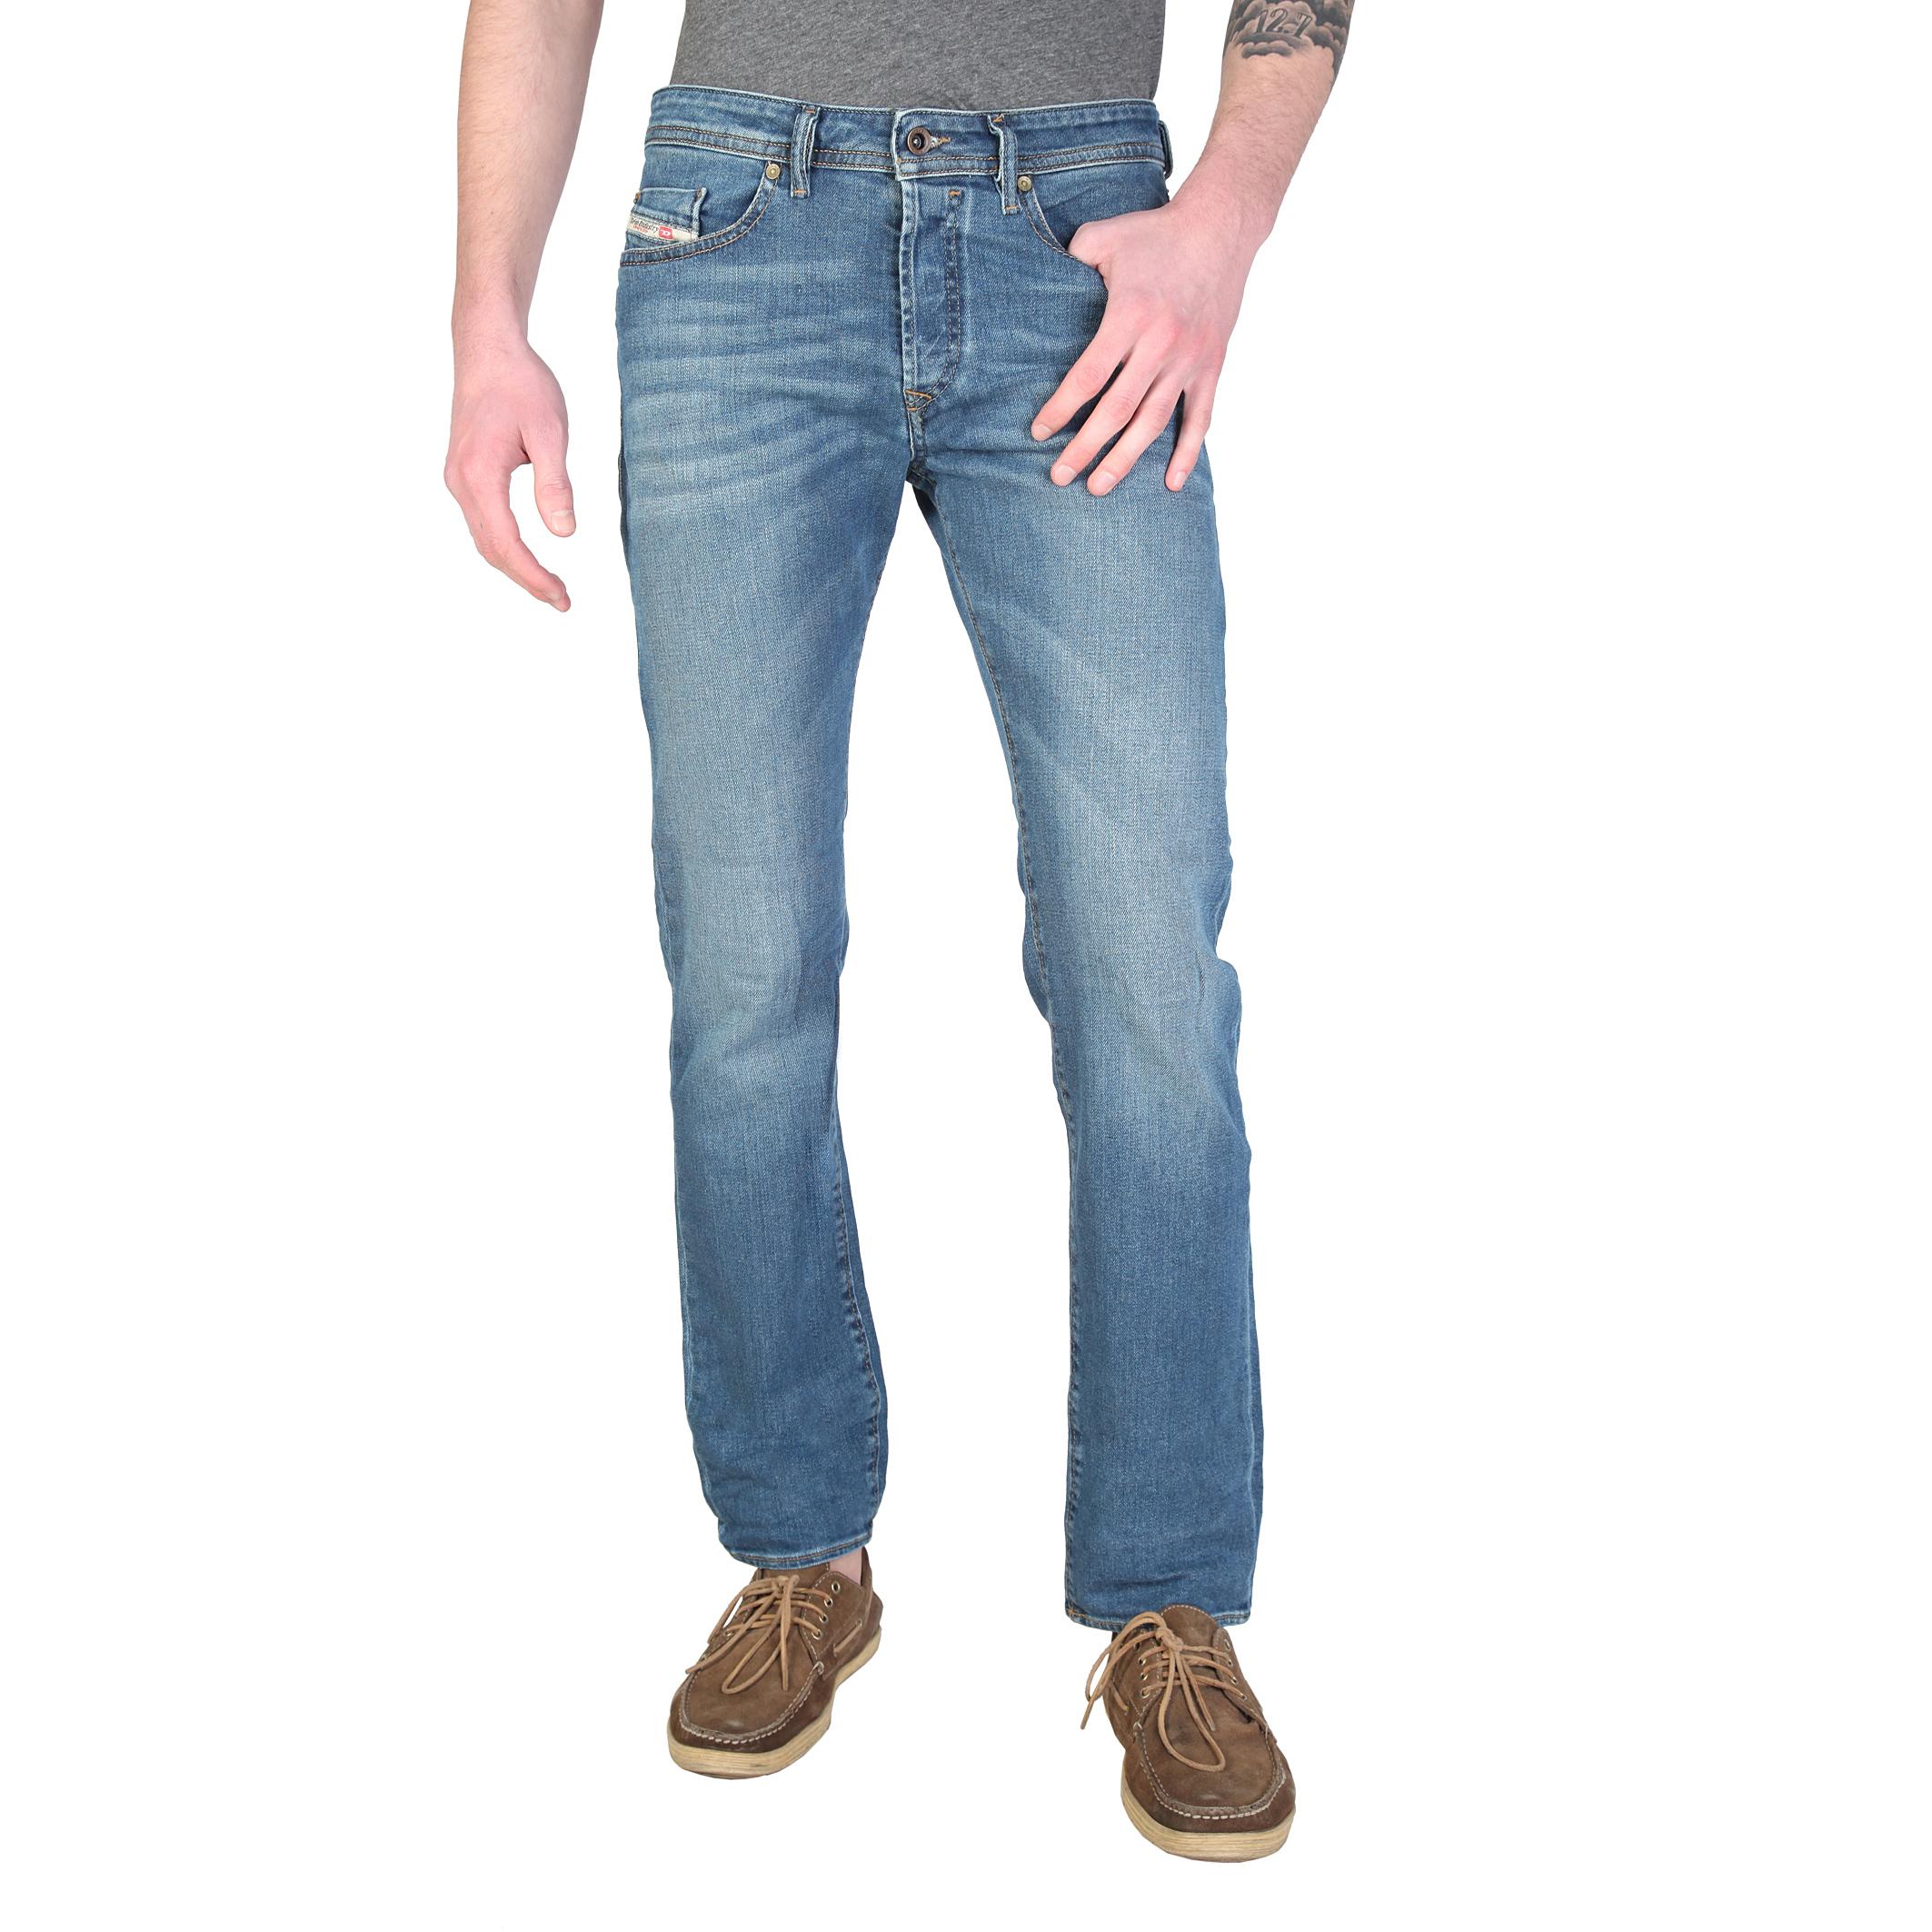 Jeans Diesel BUSTER_L32_00SDHB Uomo Blu 70645